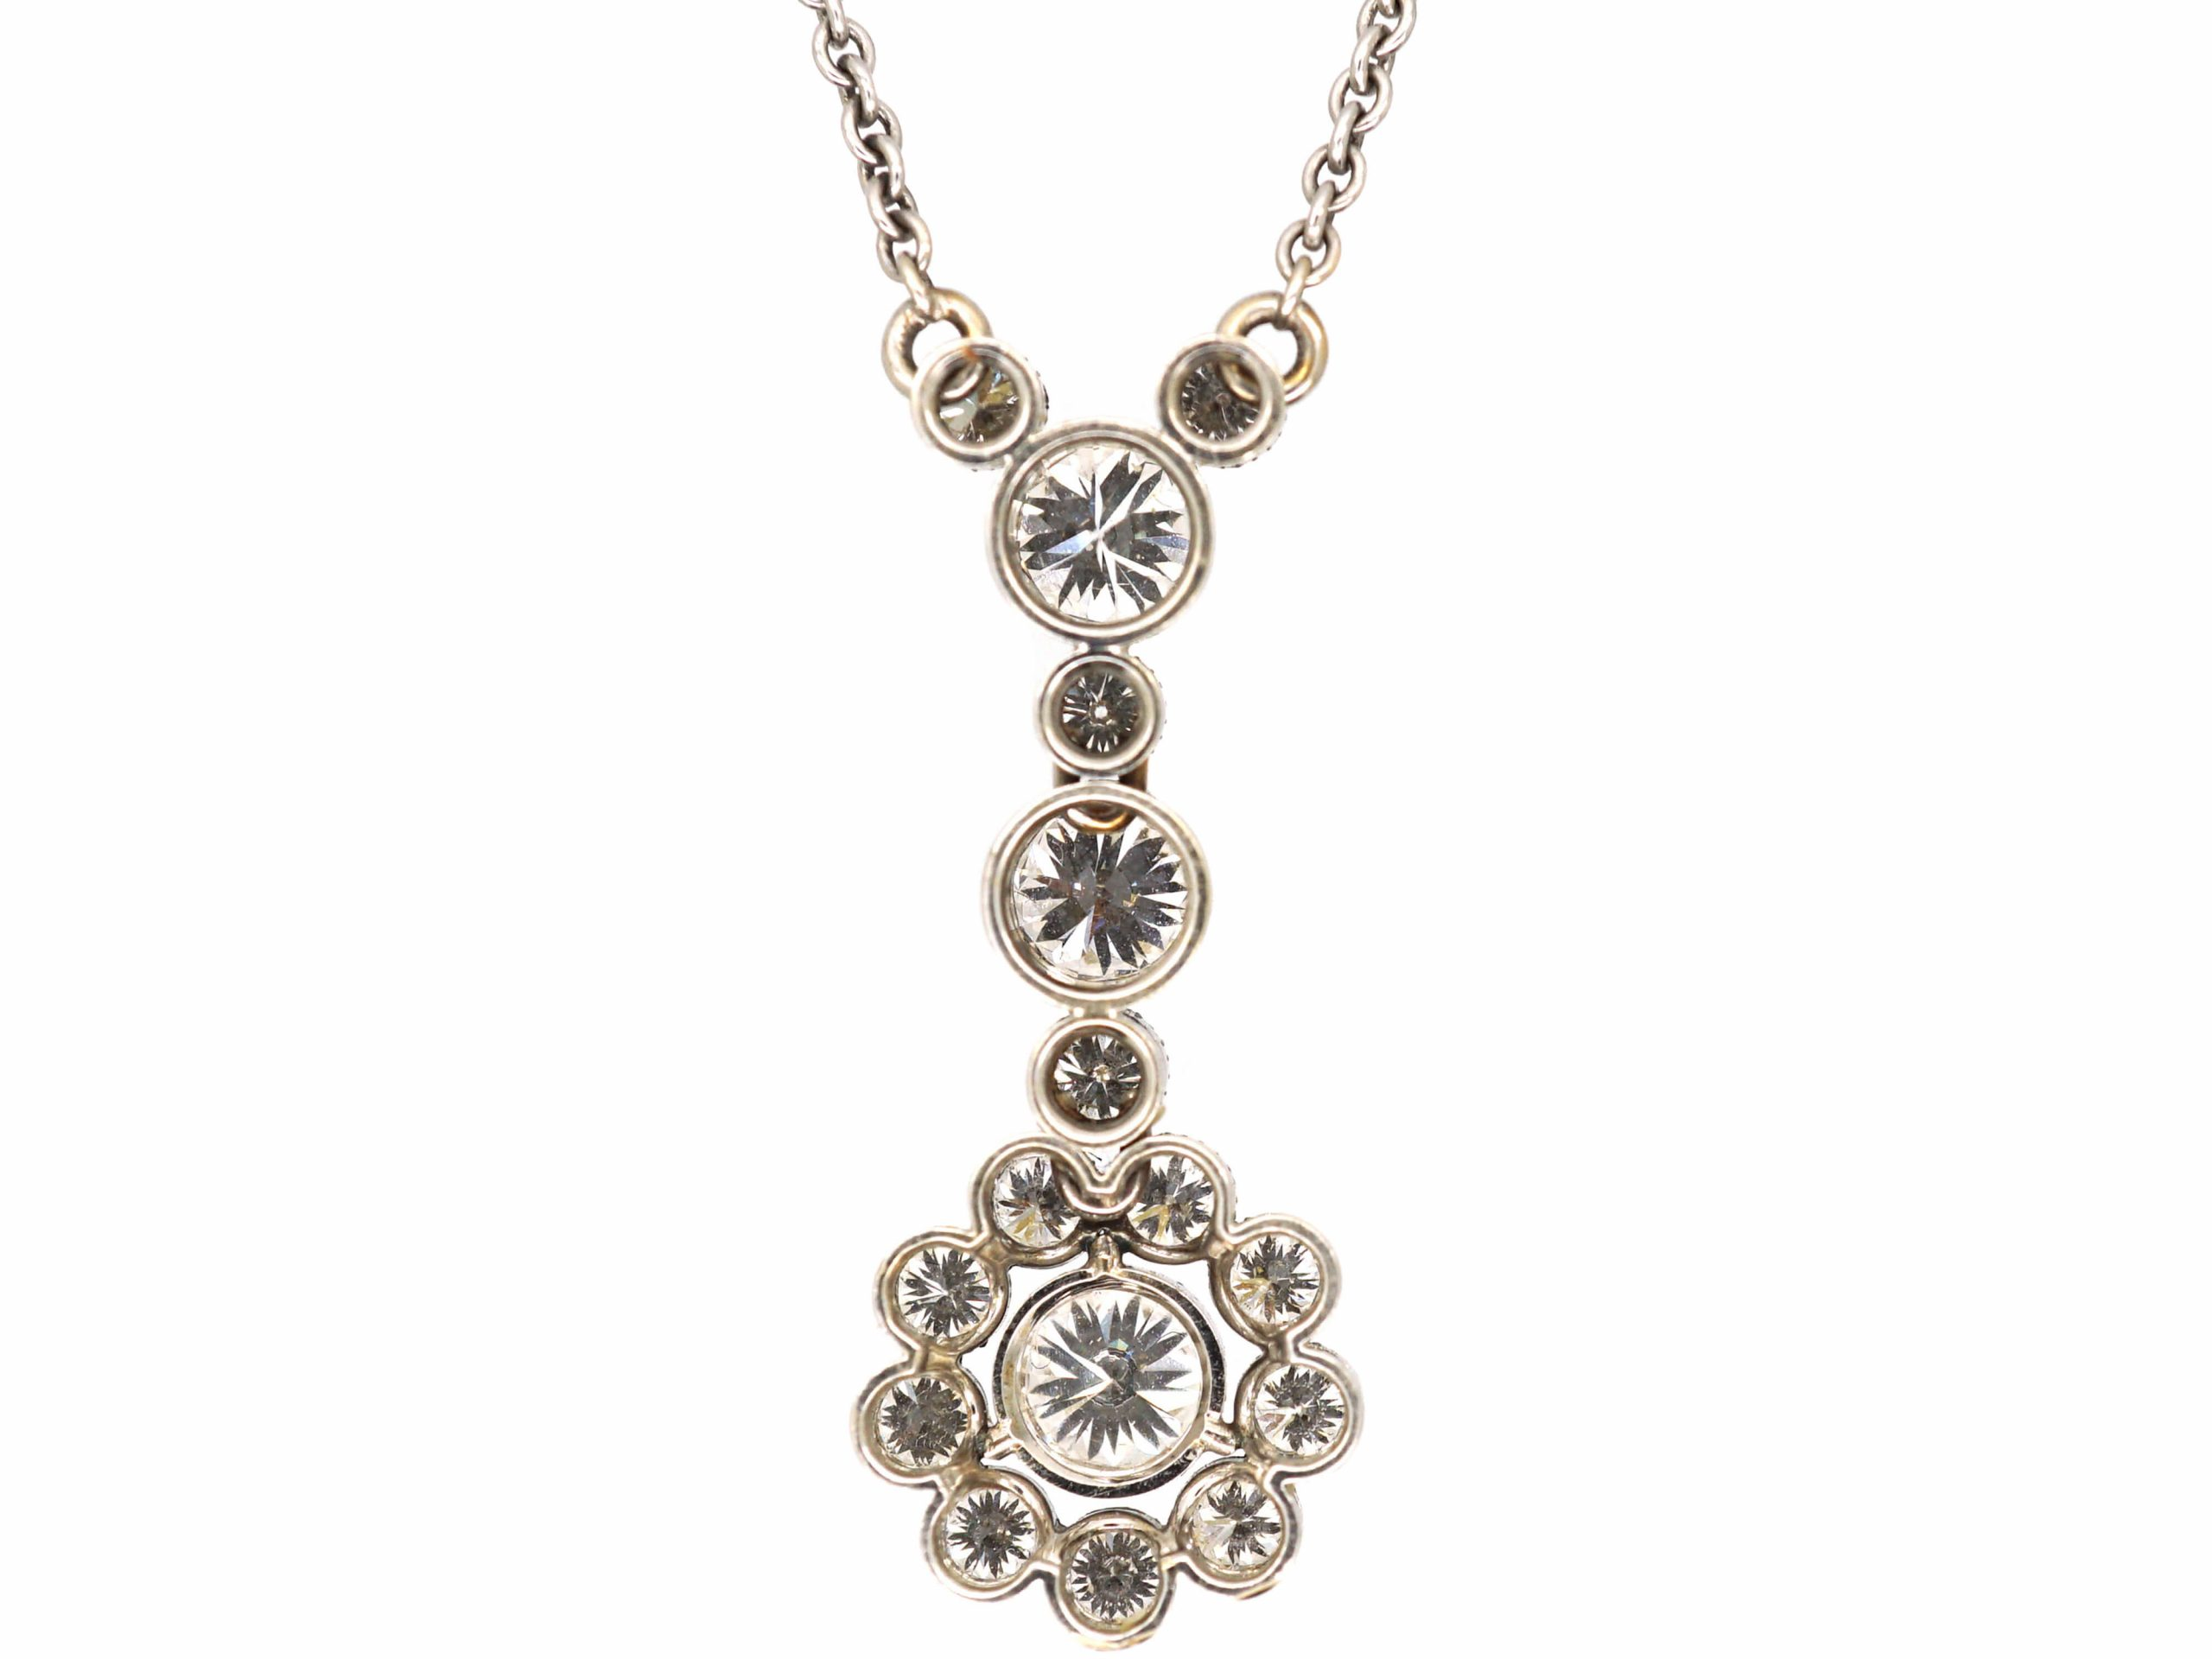 Edwardian 18ct White Gold Diamond Cluster Drop Pendant on Chain